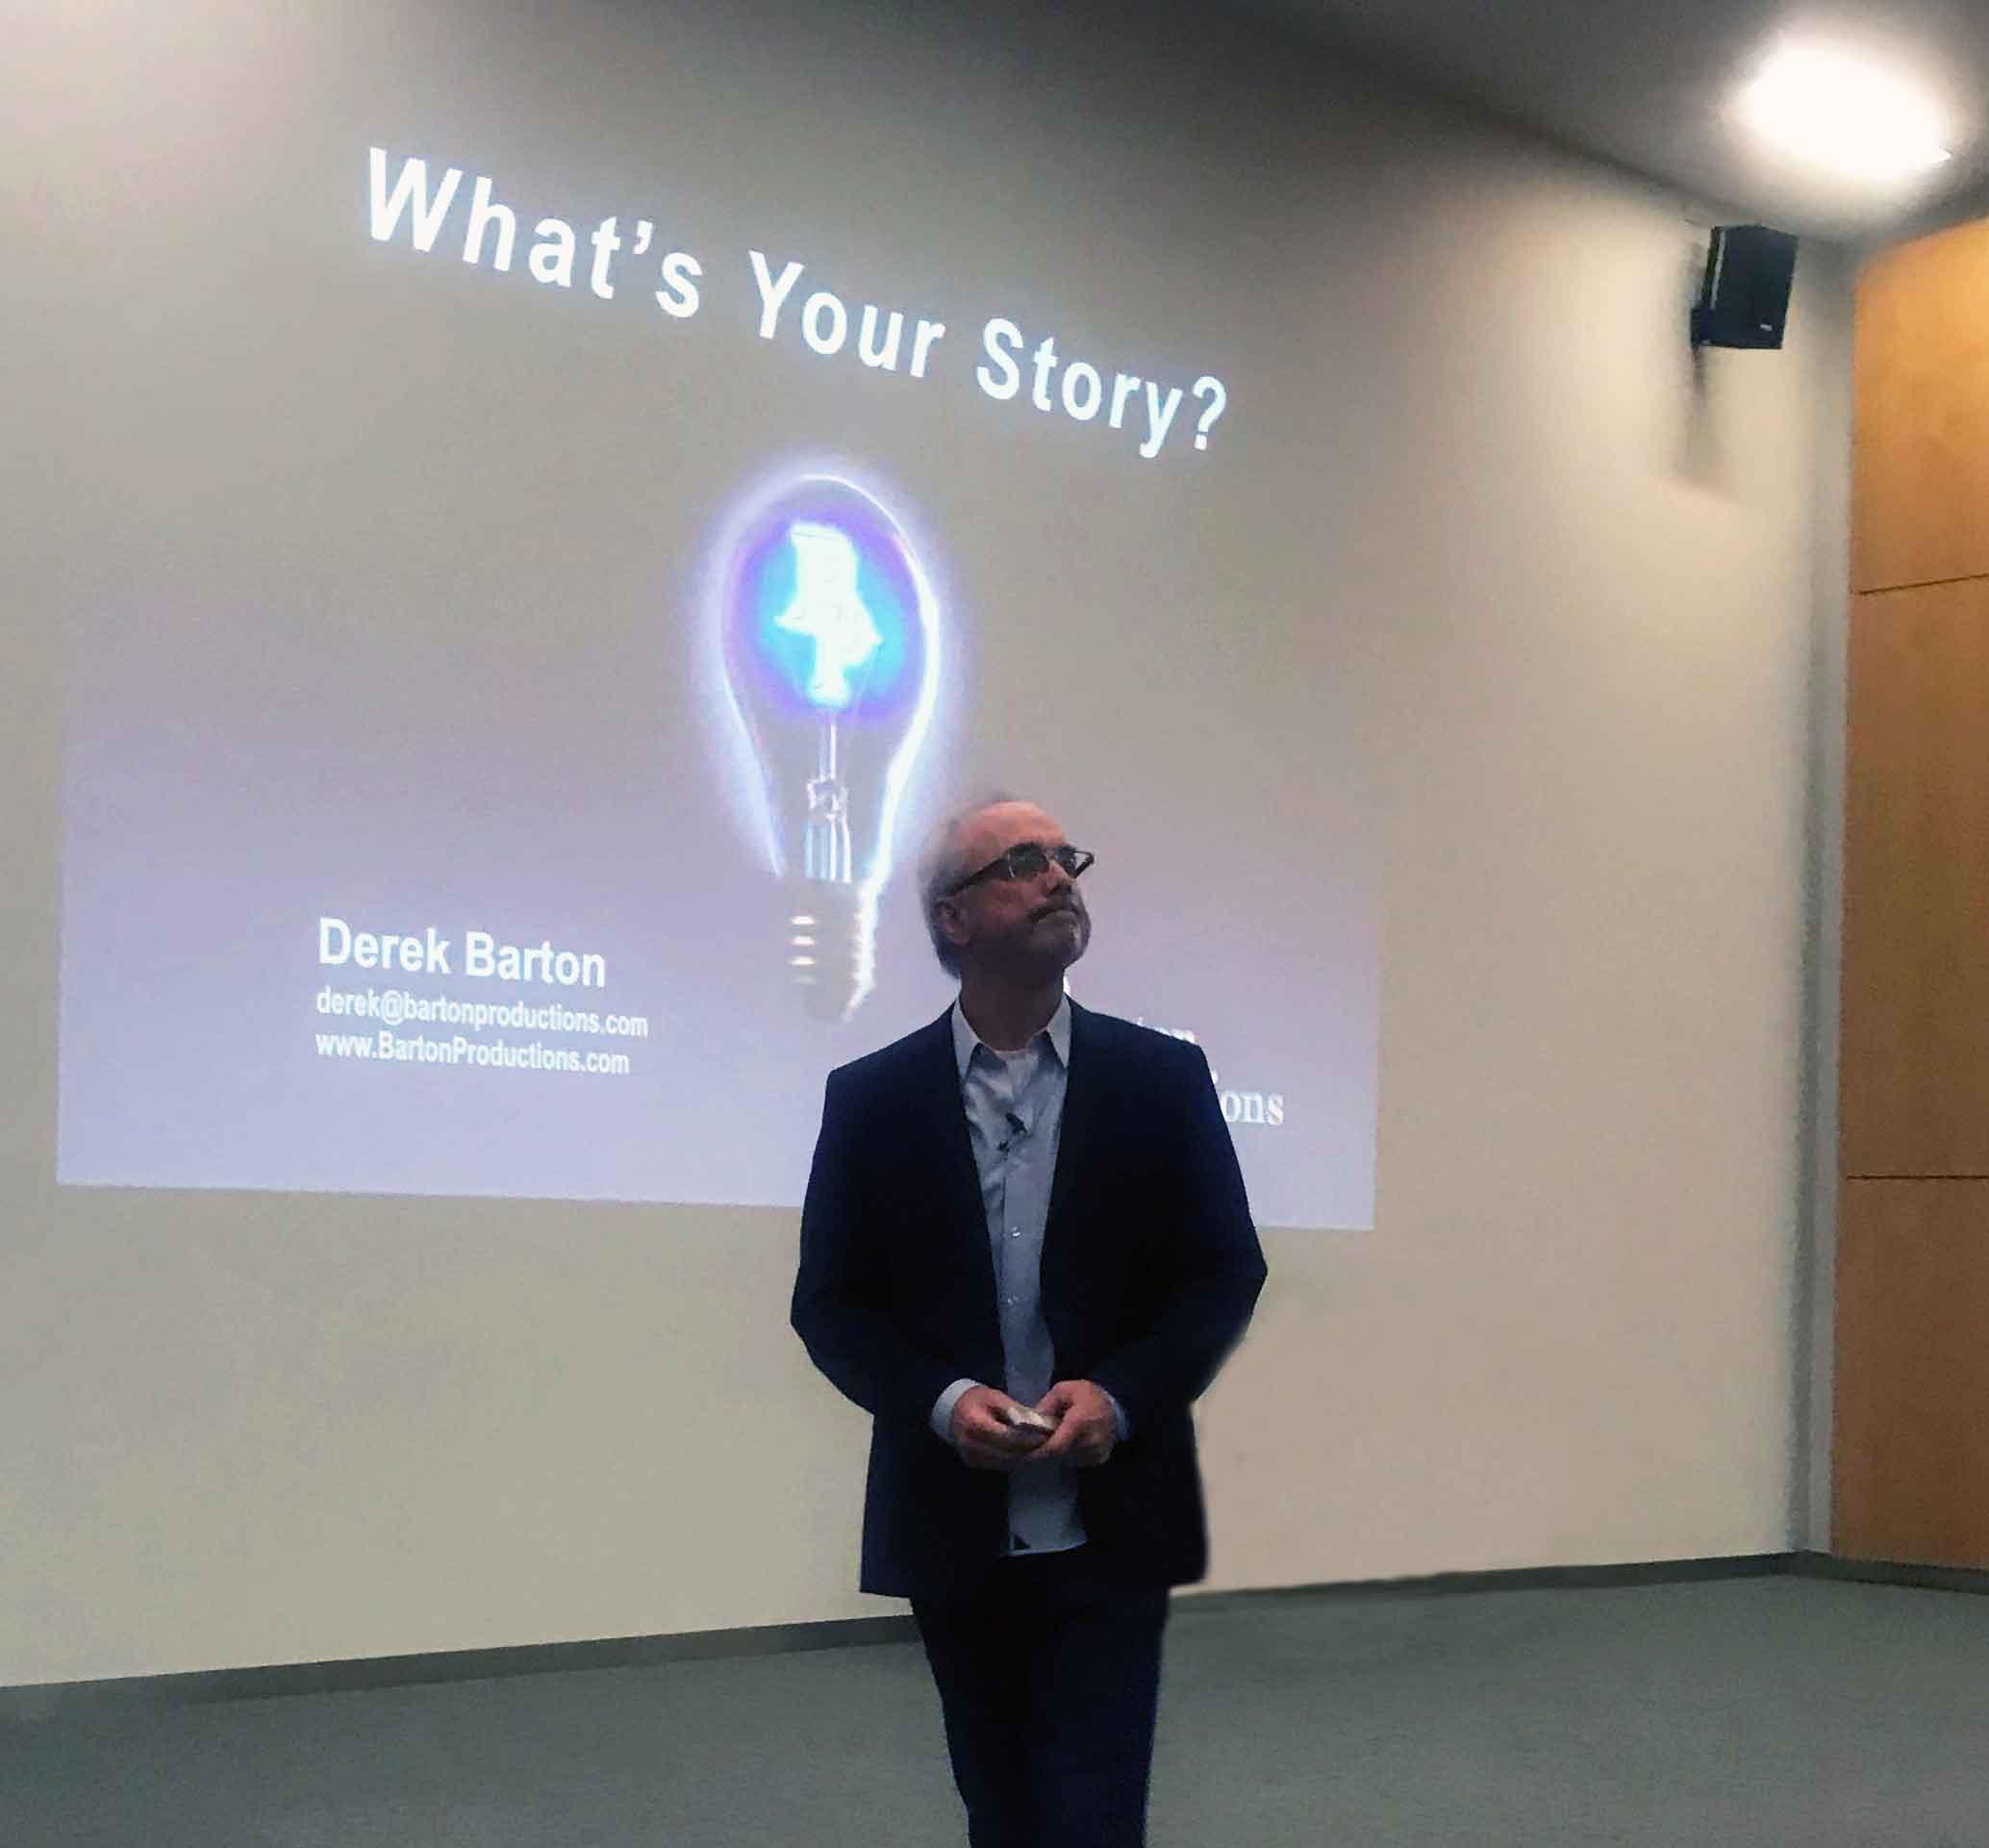 Derek Barton - Barton Productions Keynote